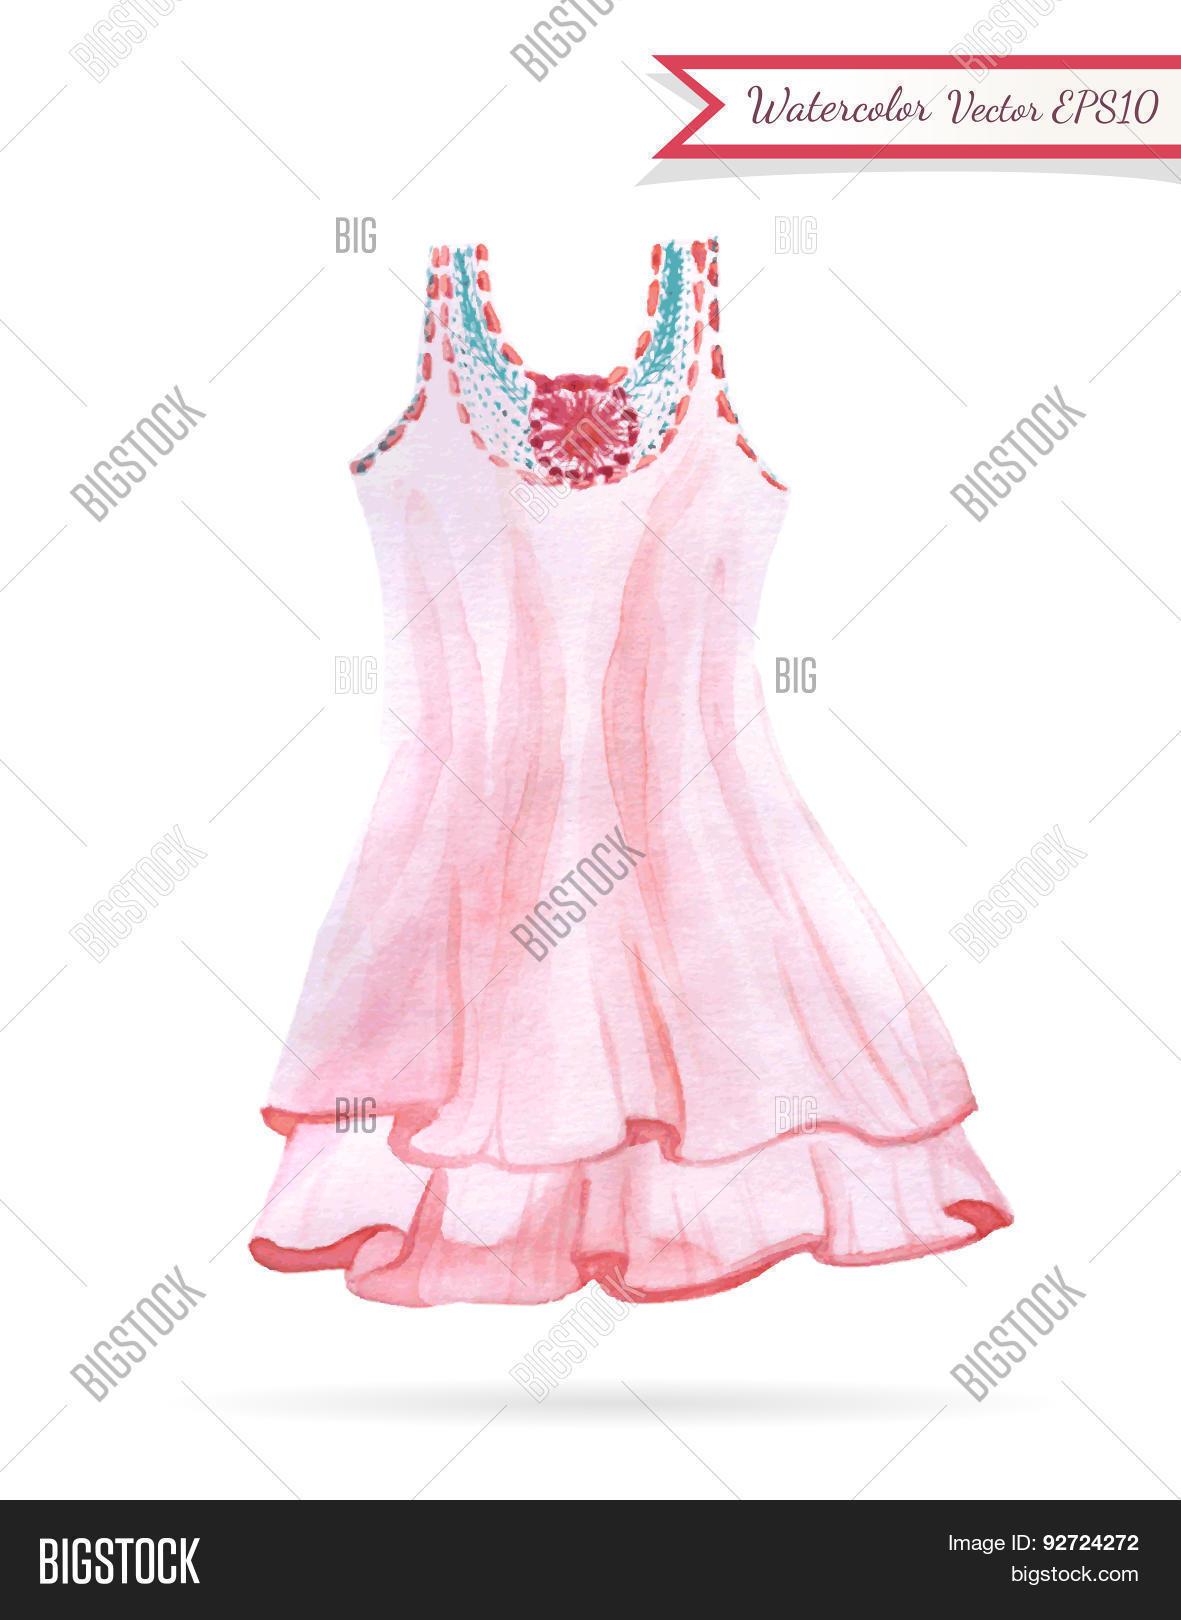 a457f6189e98 Pink Dress Watercolor Vector & Photo (Free Trial) | Bigstock